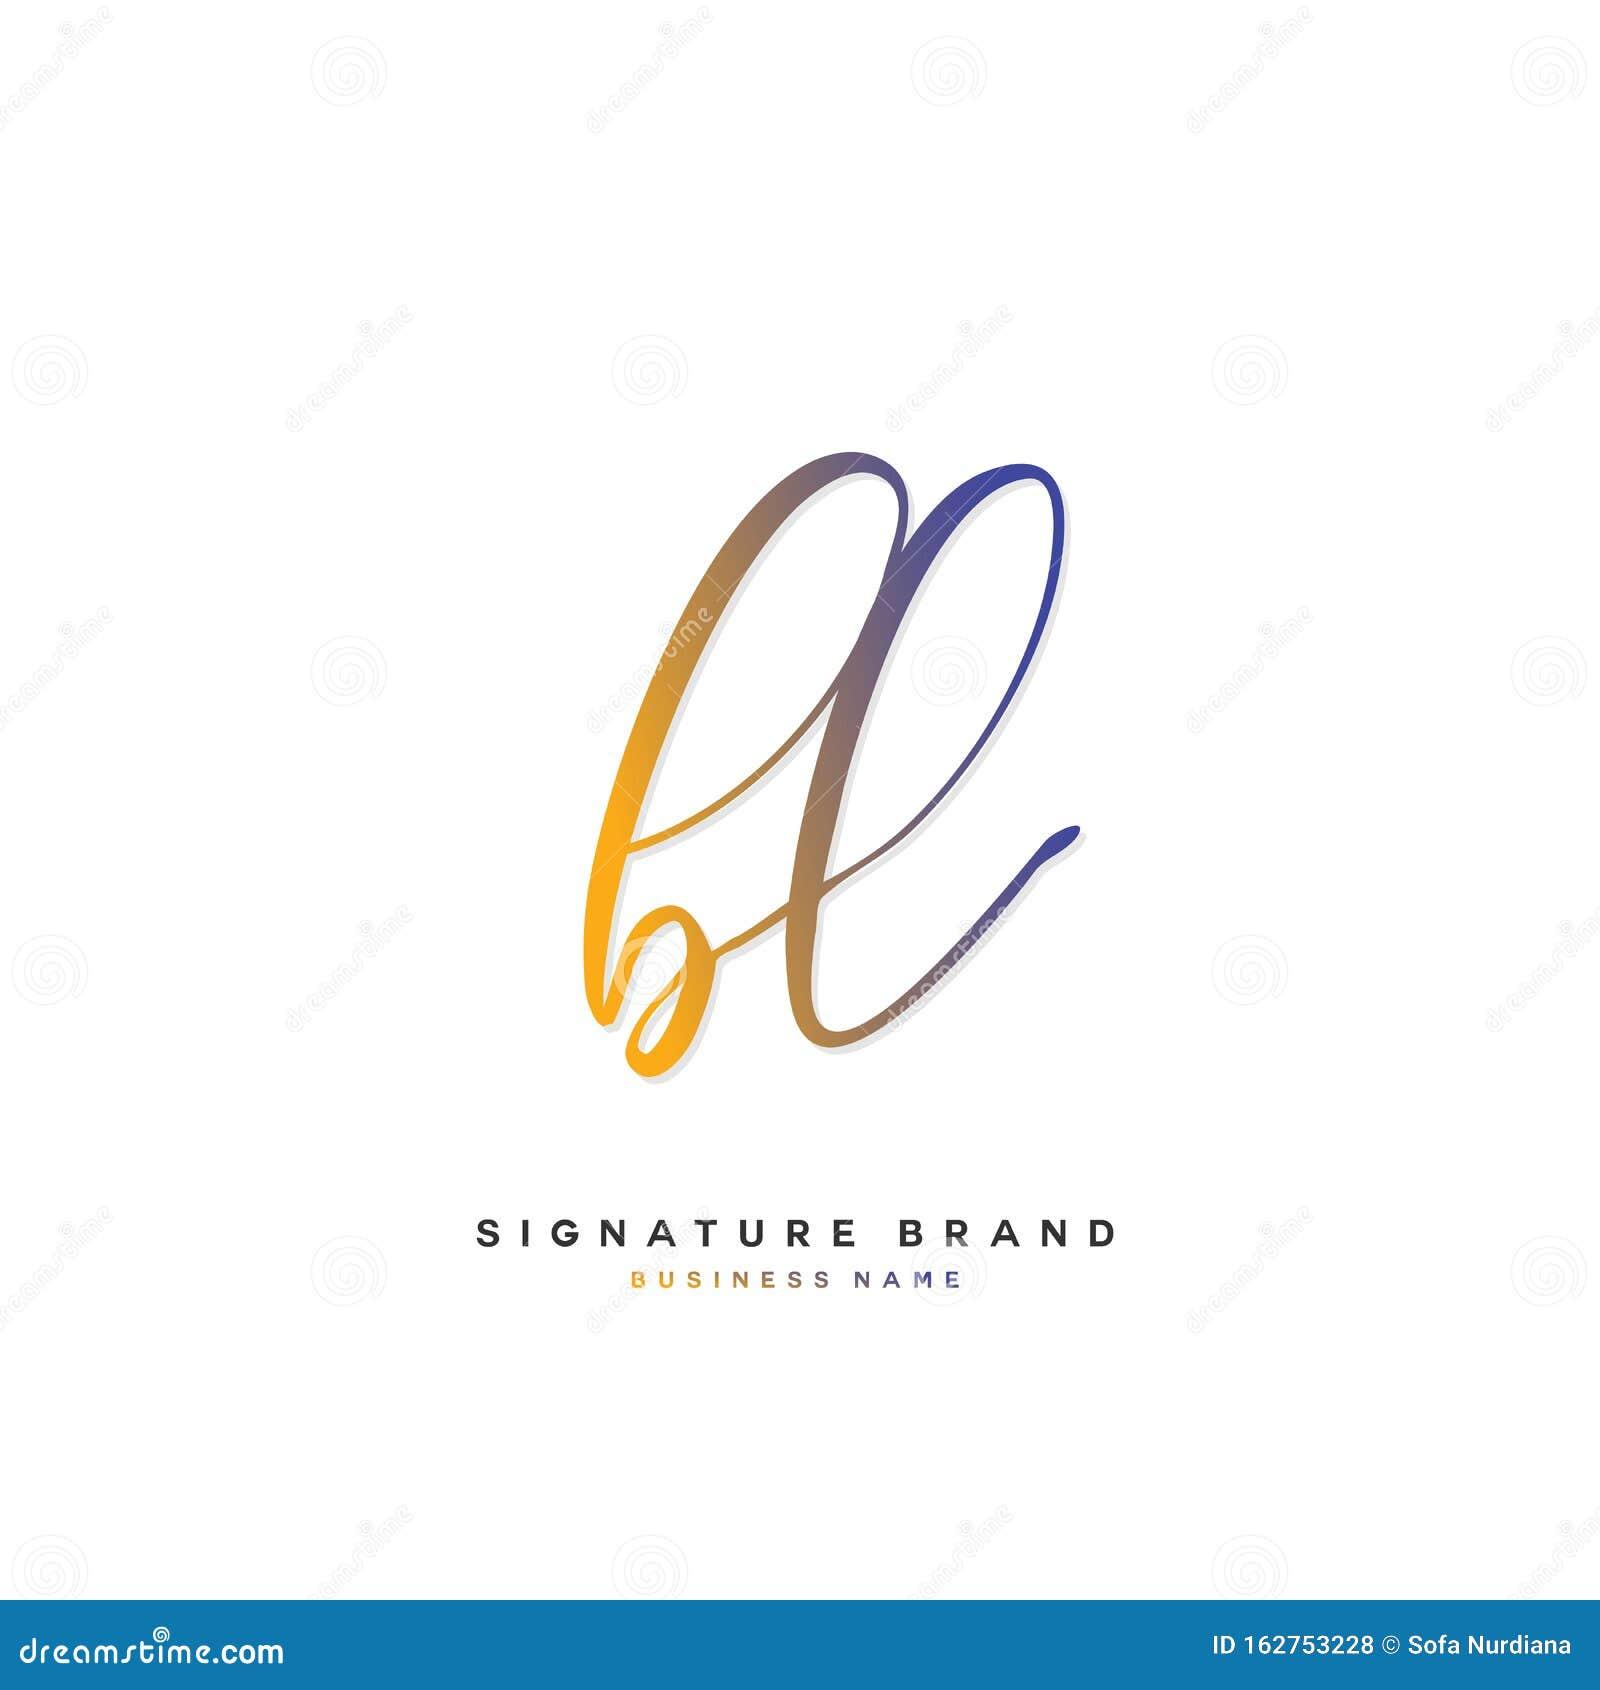 B L Bl Initial Letter Handwriting And Signature Logo Concept Design Stock Vector Illustration Of Monogram Icon 162753228